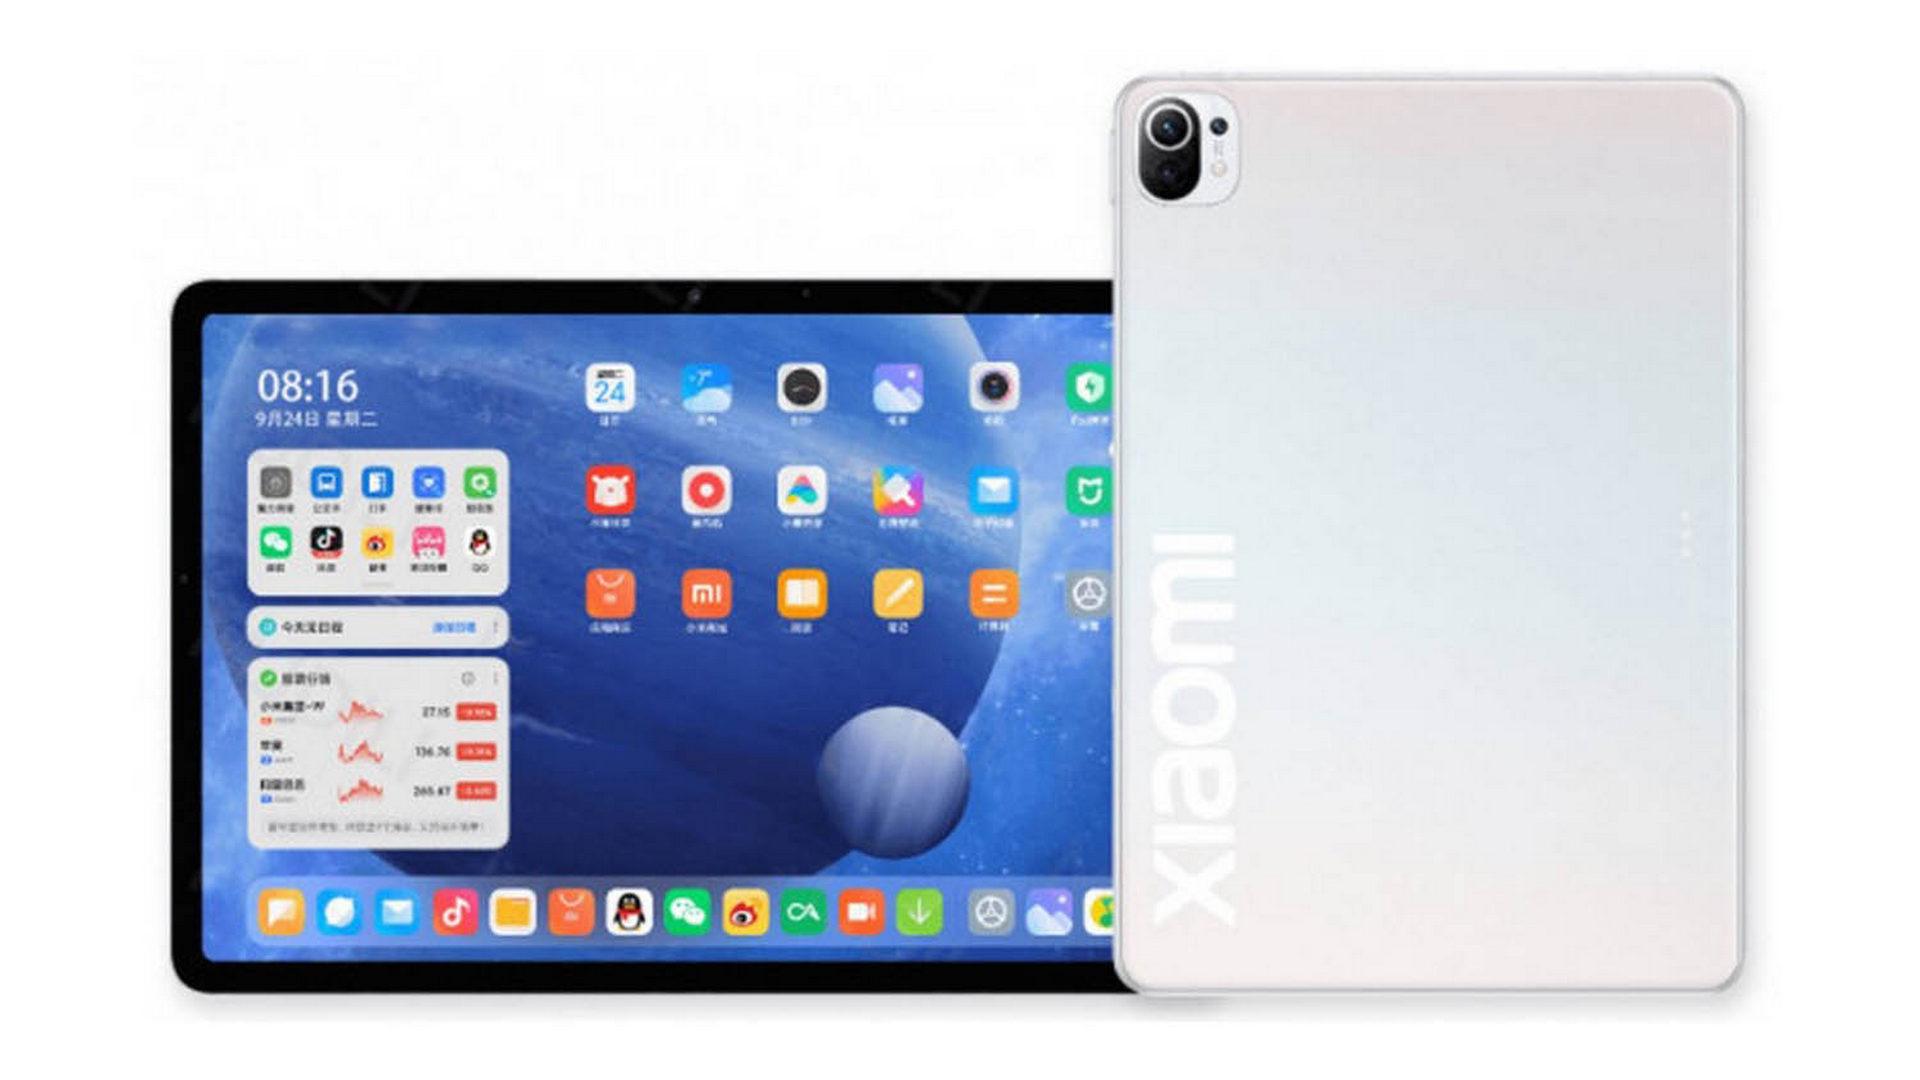 Xiaomi Mi Pad 5 : voici ce que l'on attend de la future tablette Android